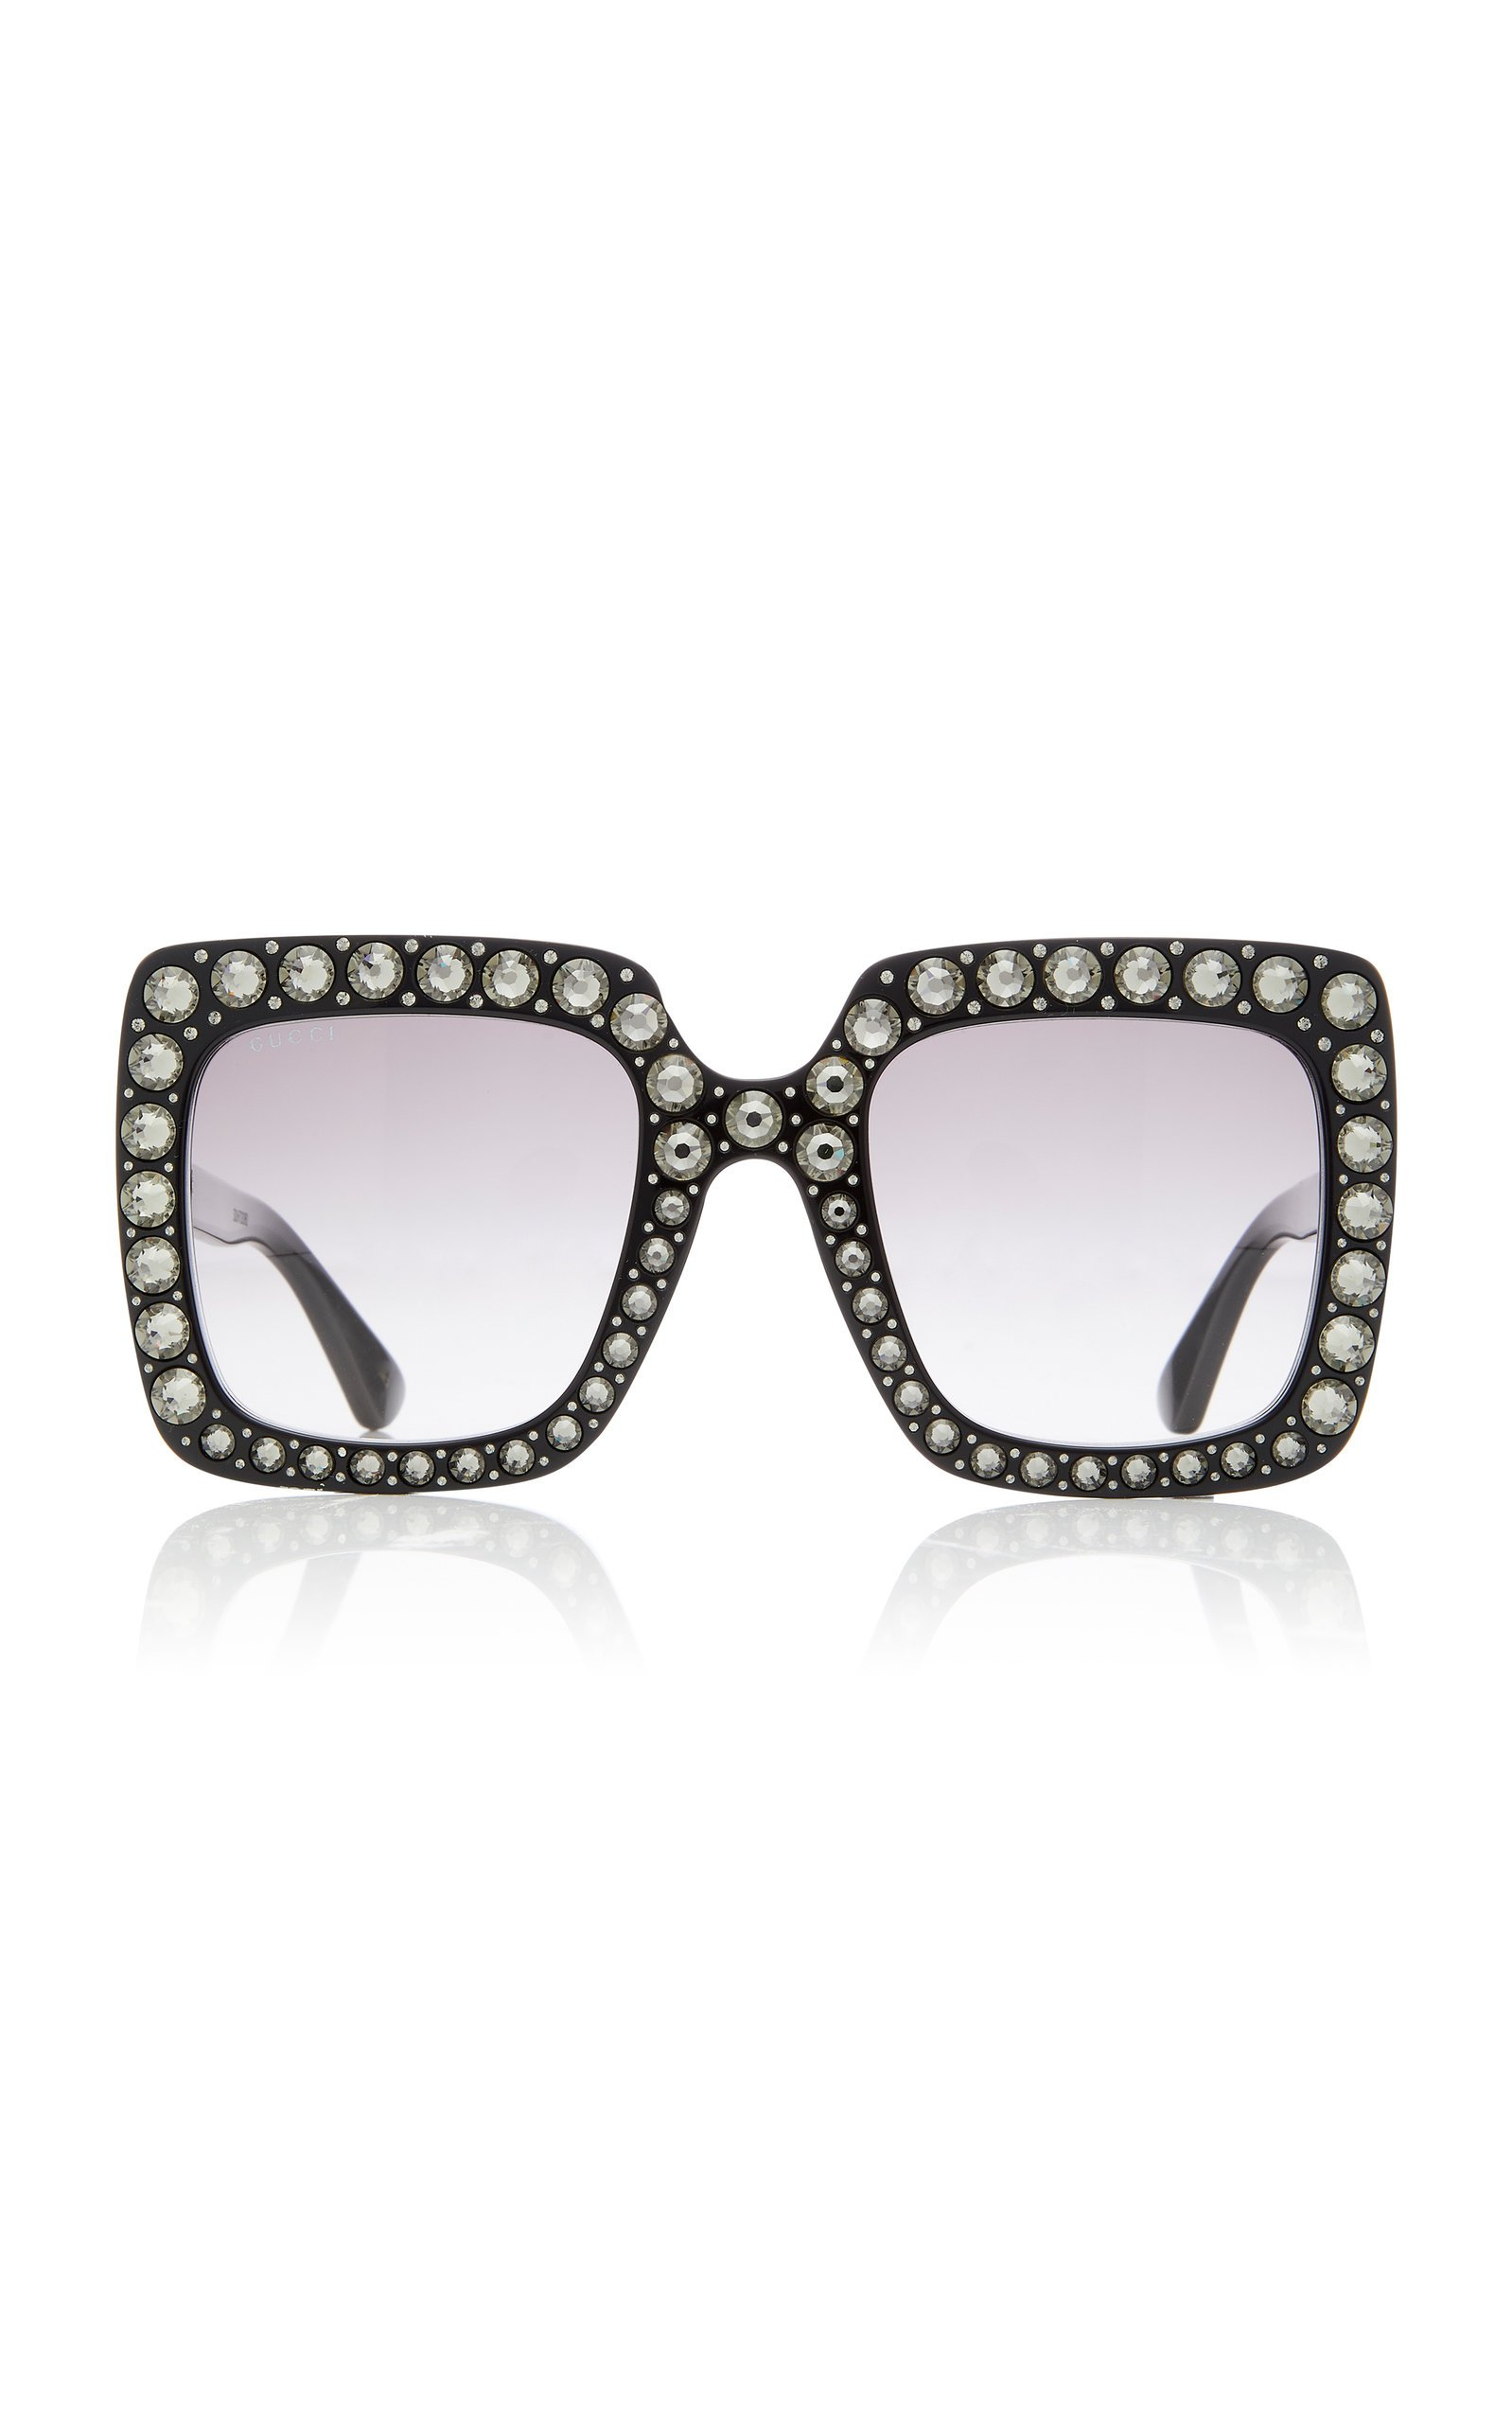 Gucci Sunglasses Crystal-Embellished Square-Frame Sunglasses